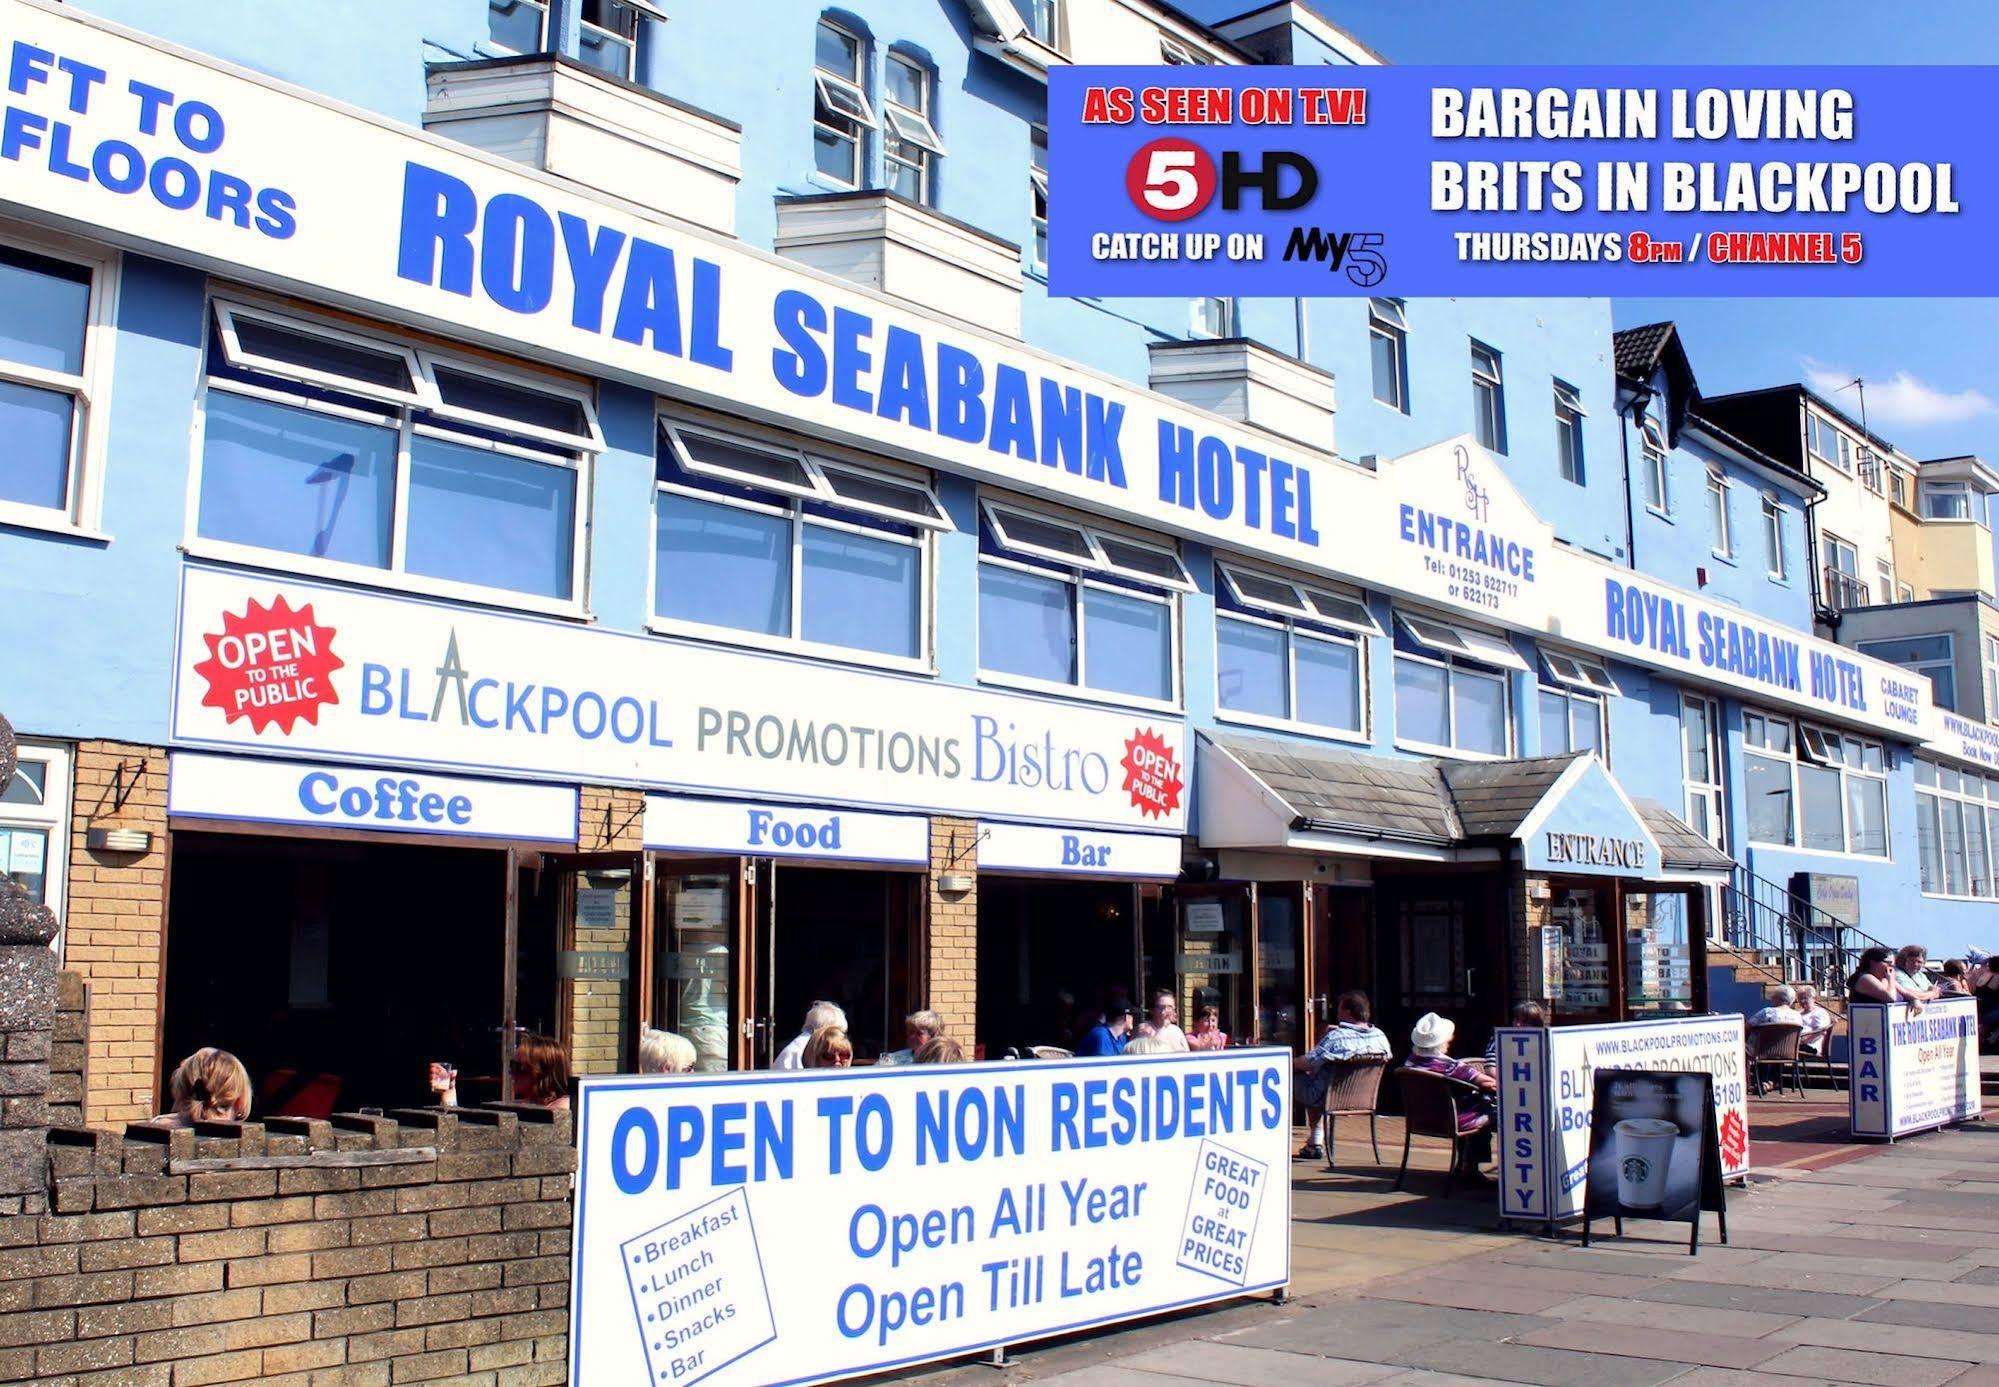 The Royal Seabank